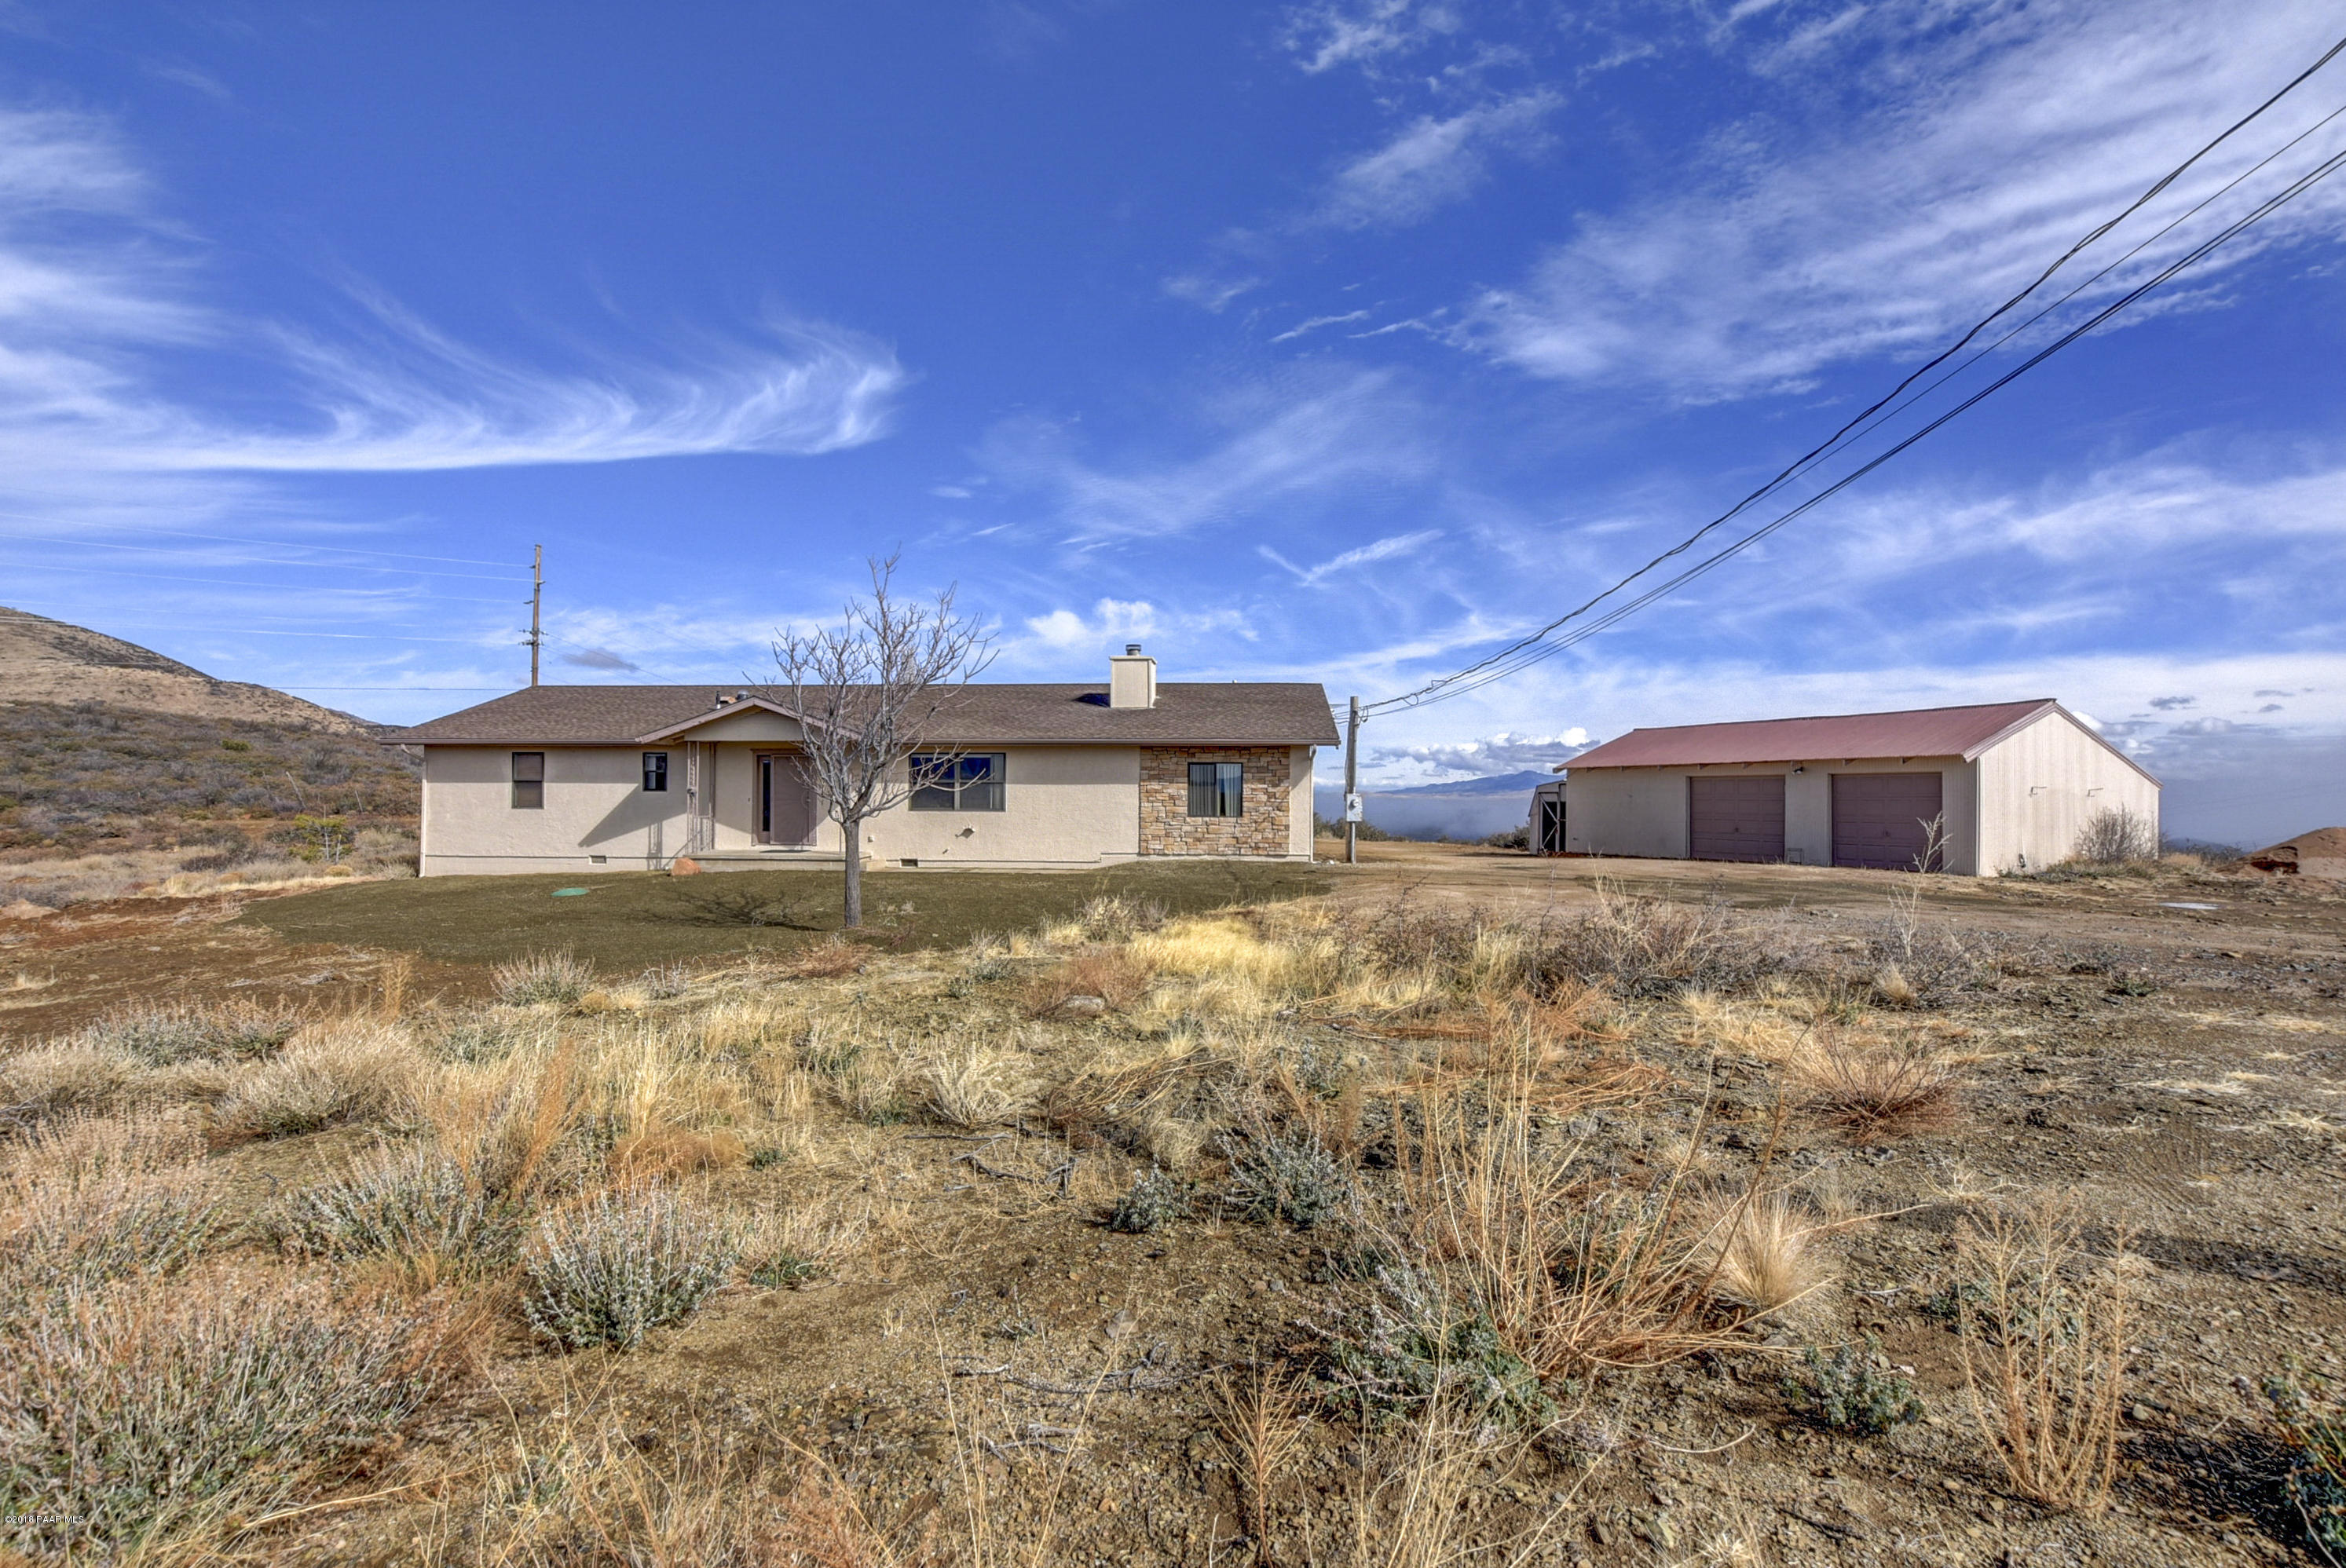 6090 S Hankins Road, Mayer, AZ 86333 – PENDING